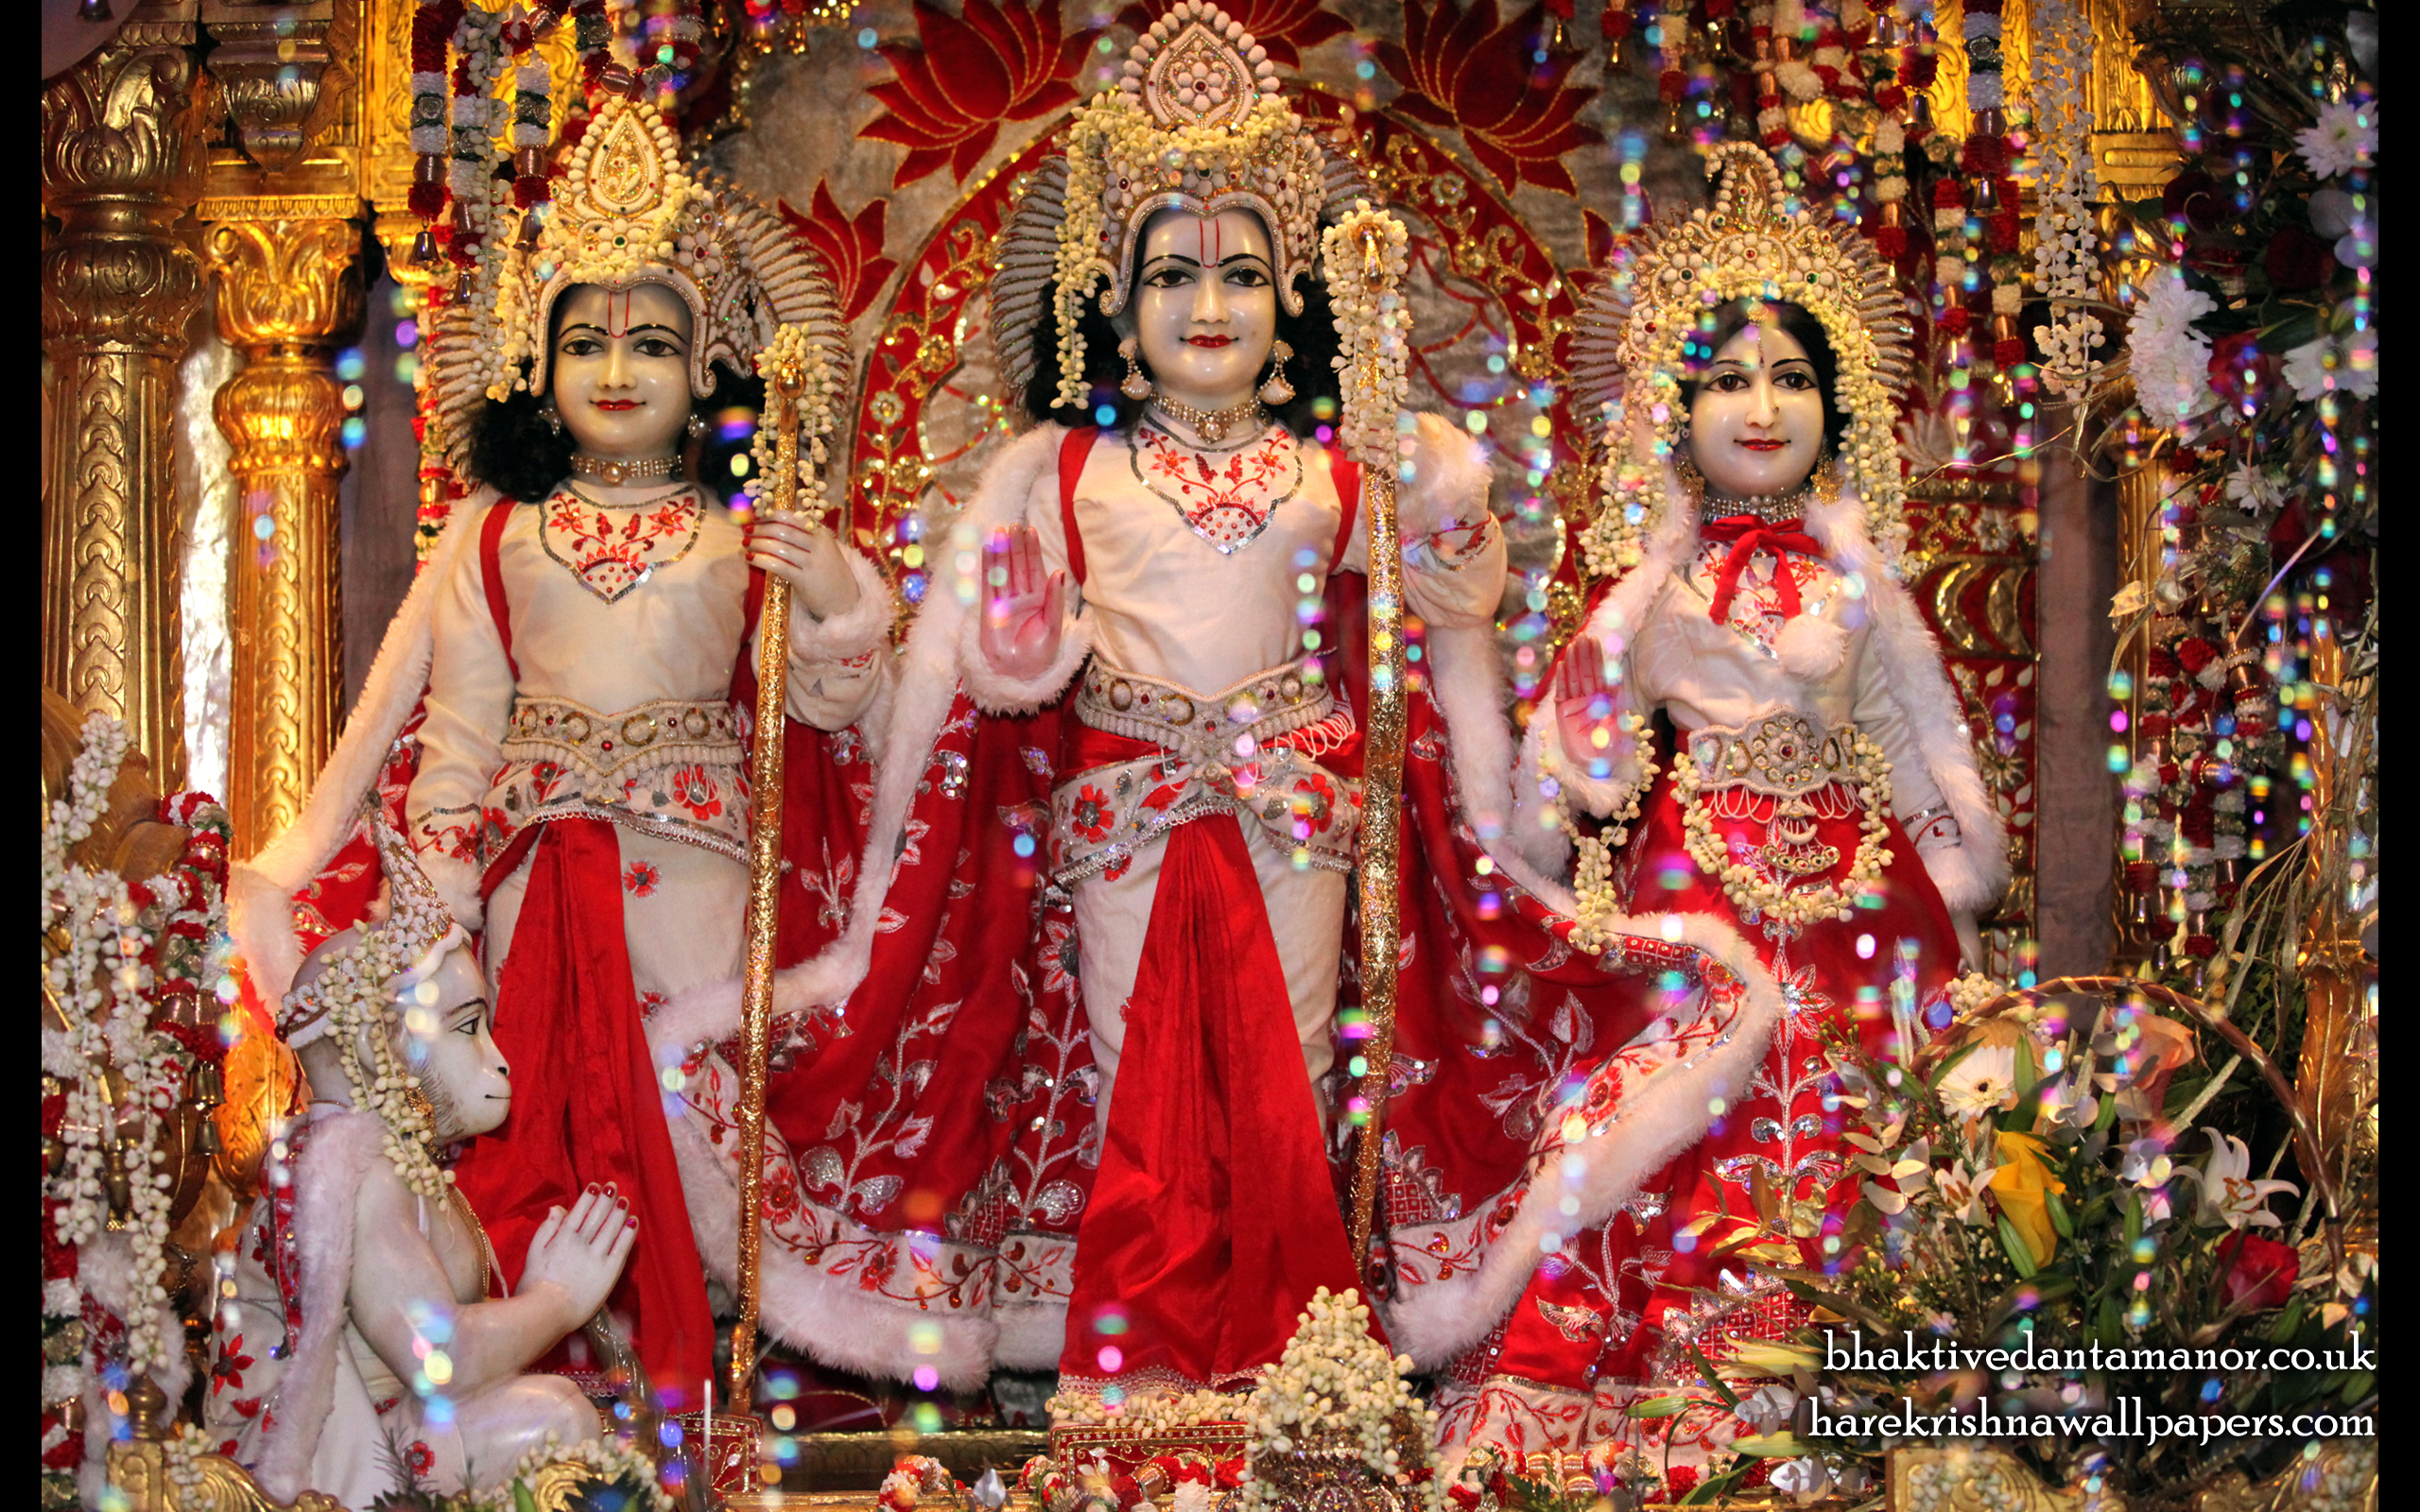 Sri Sri Sita Rama Laxman Hanuman Wallpaper (010) Size 2560x1600 Download